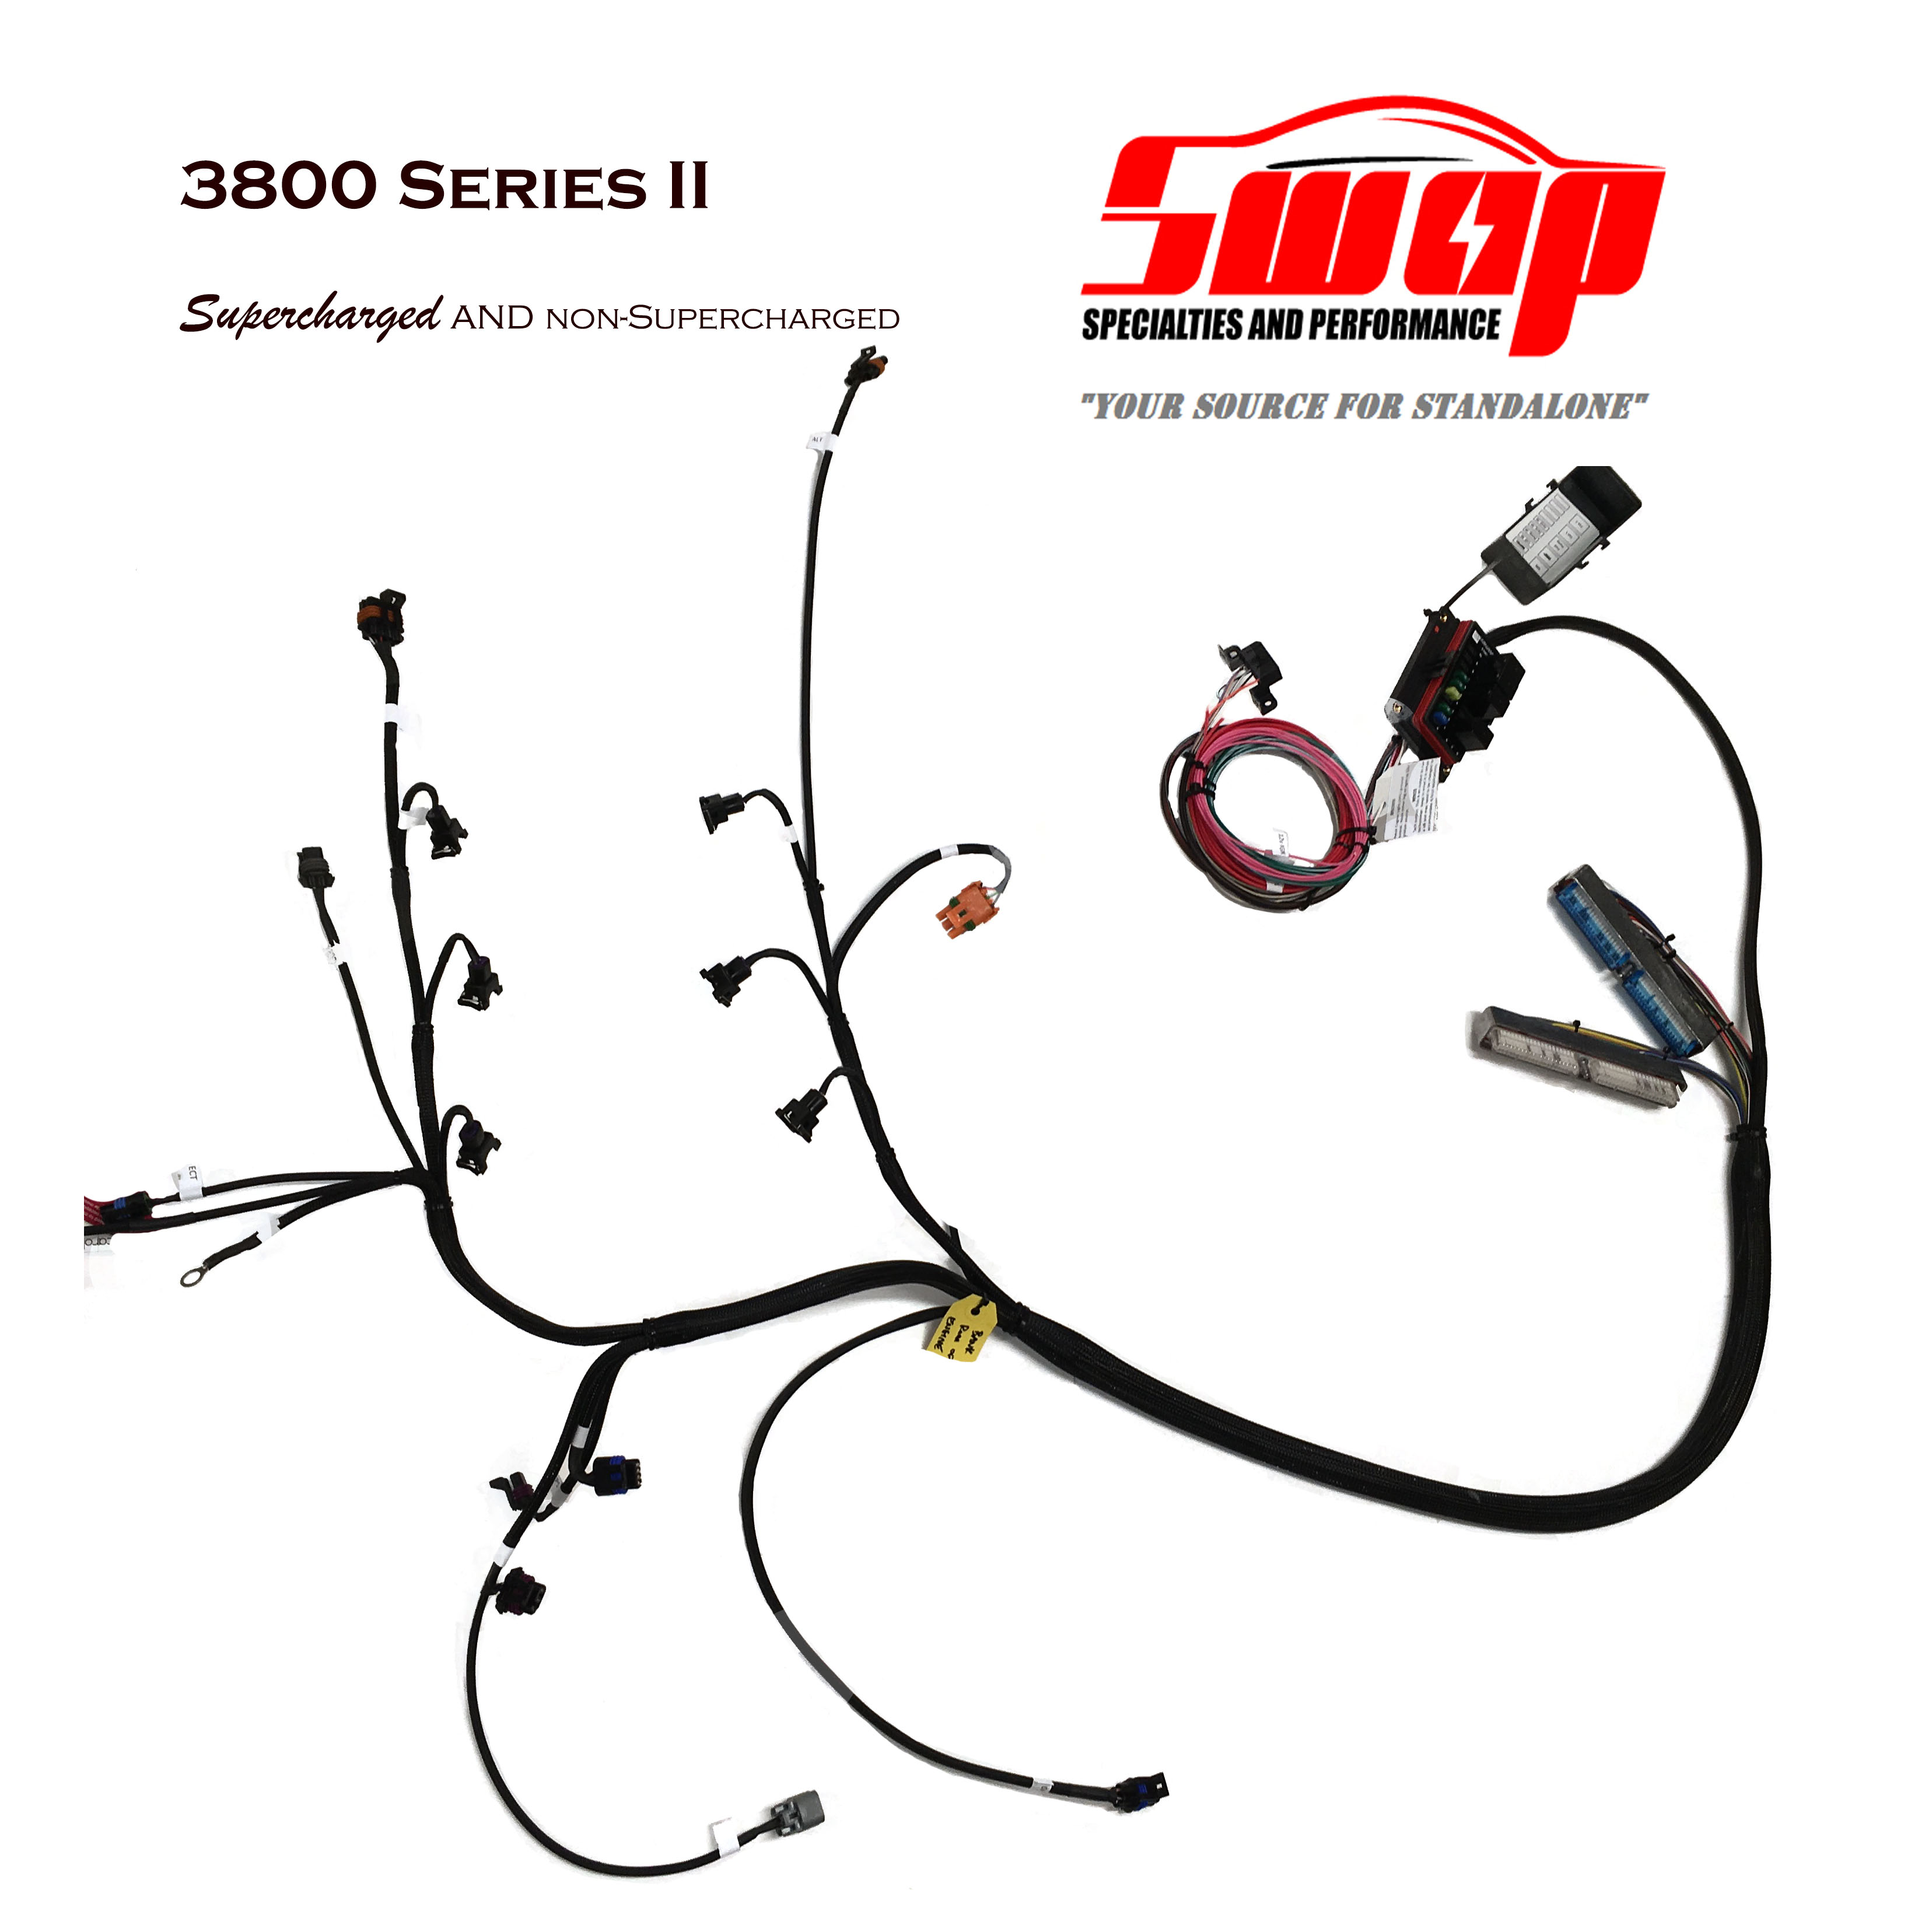 hemi wiring harness diy